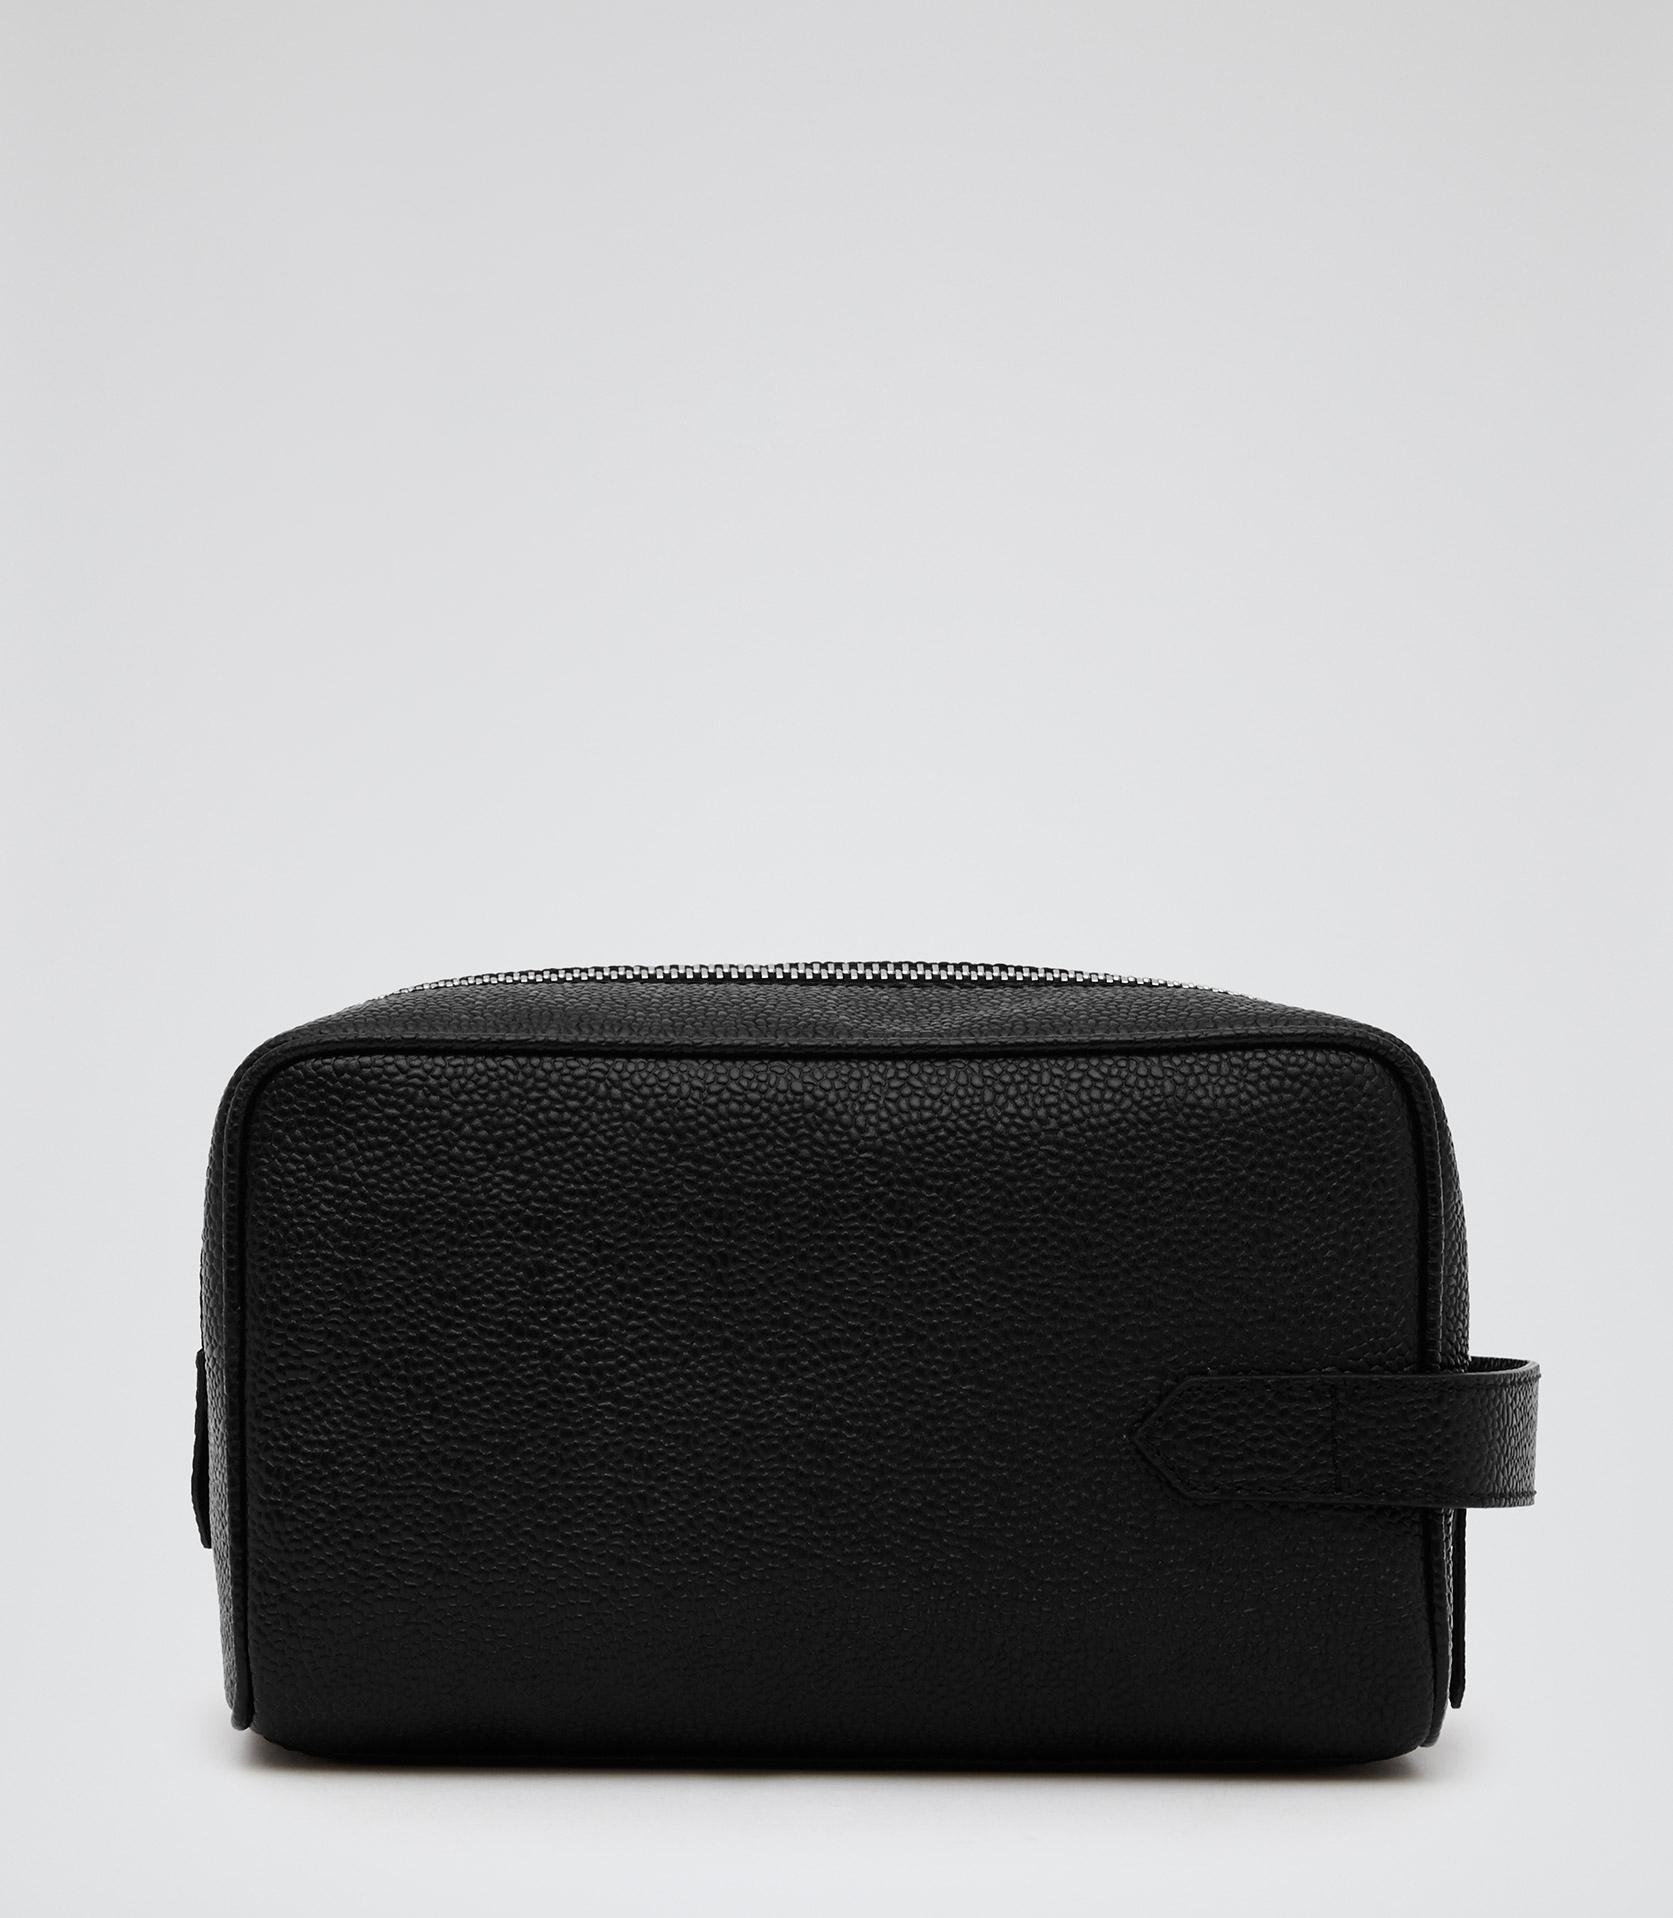 0b4cb42d60 Reiss Eldridge Pebbled Leather Wash Bag in Black for Men - Lyst